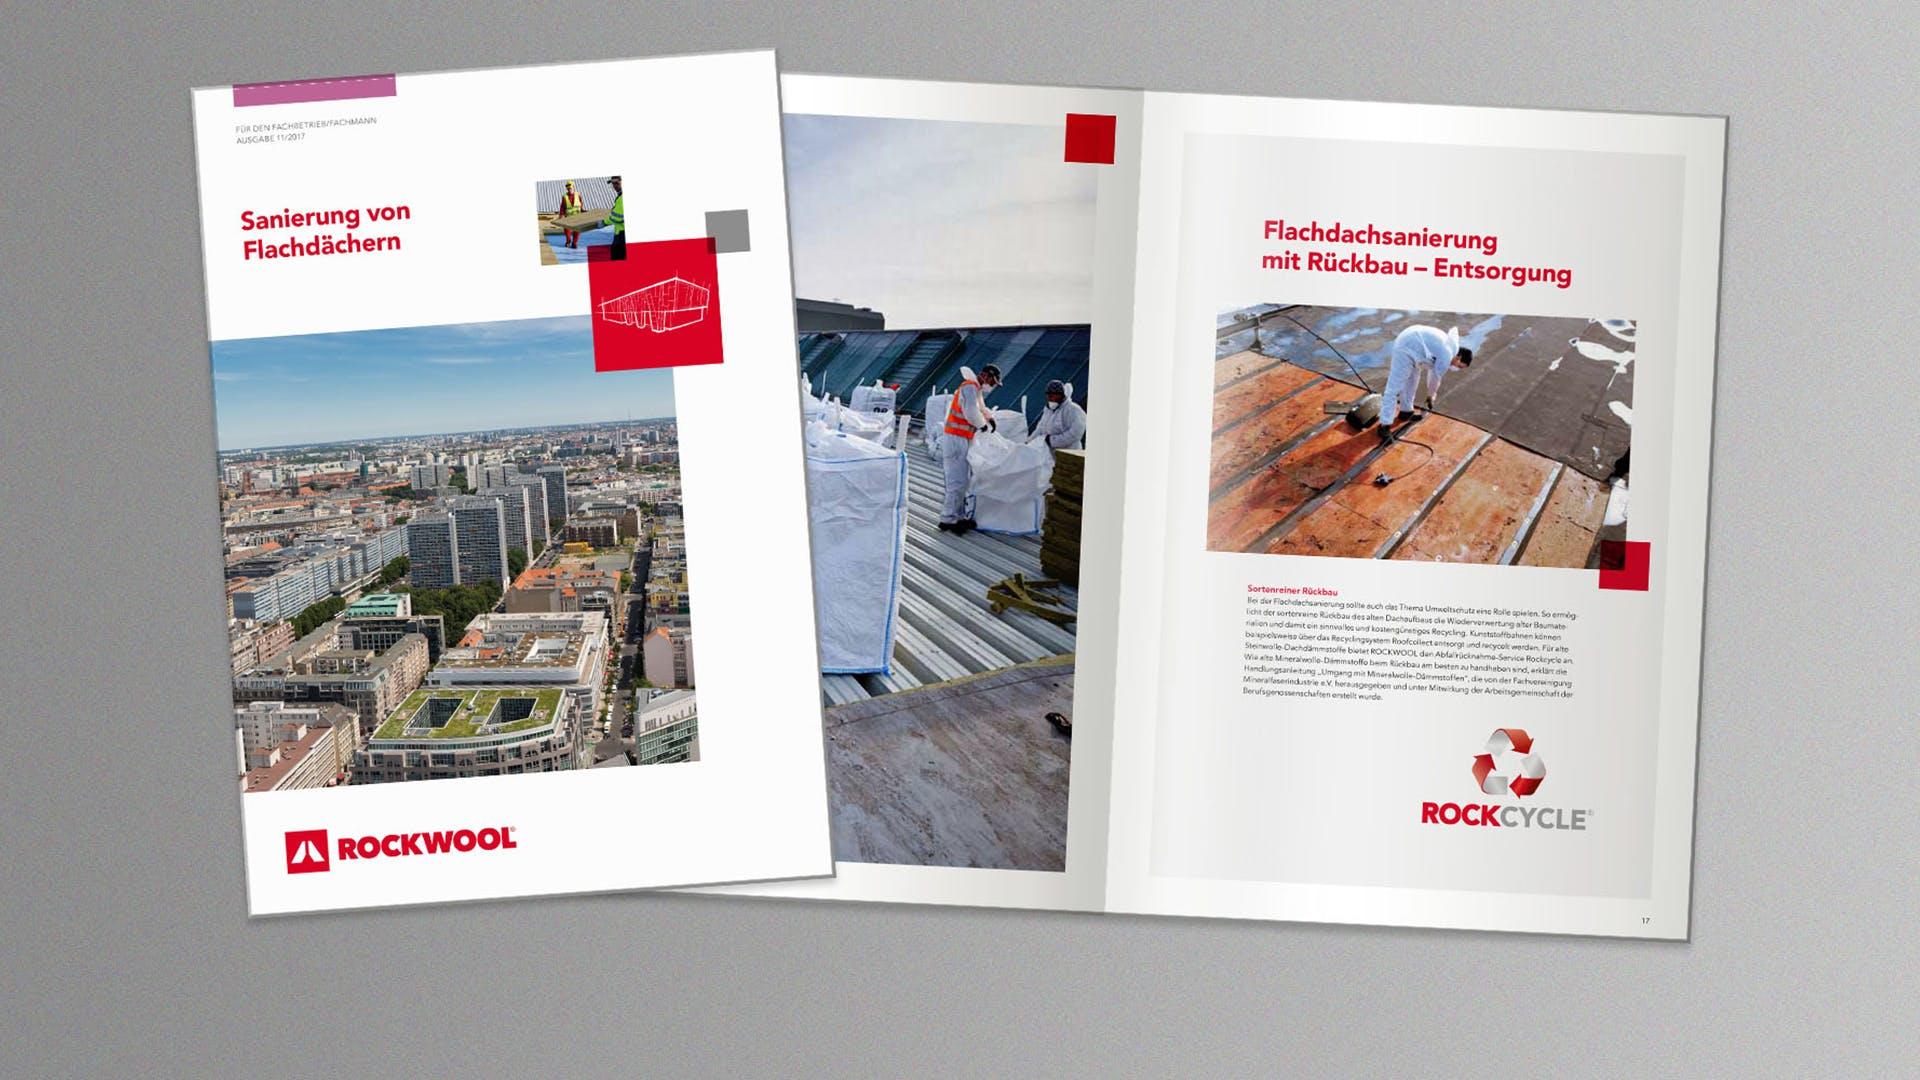 thumb, thumbnail, brochure, broschüre sanierung von flachdächern, germany